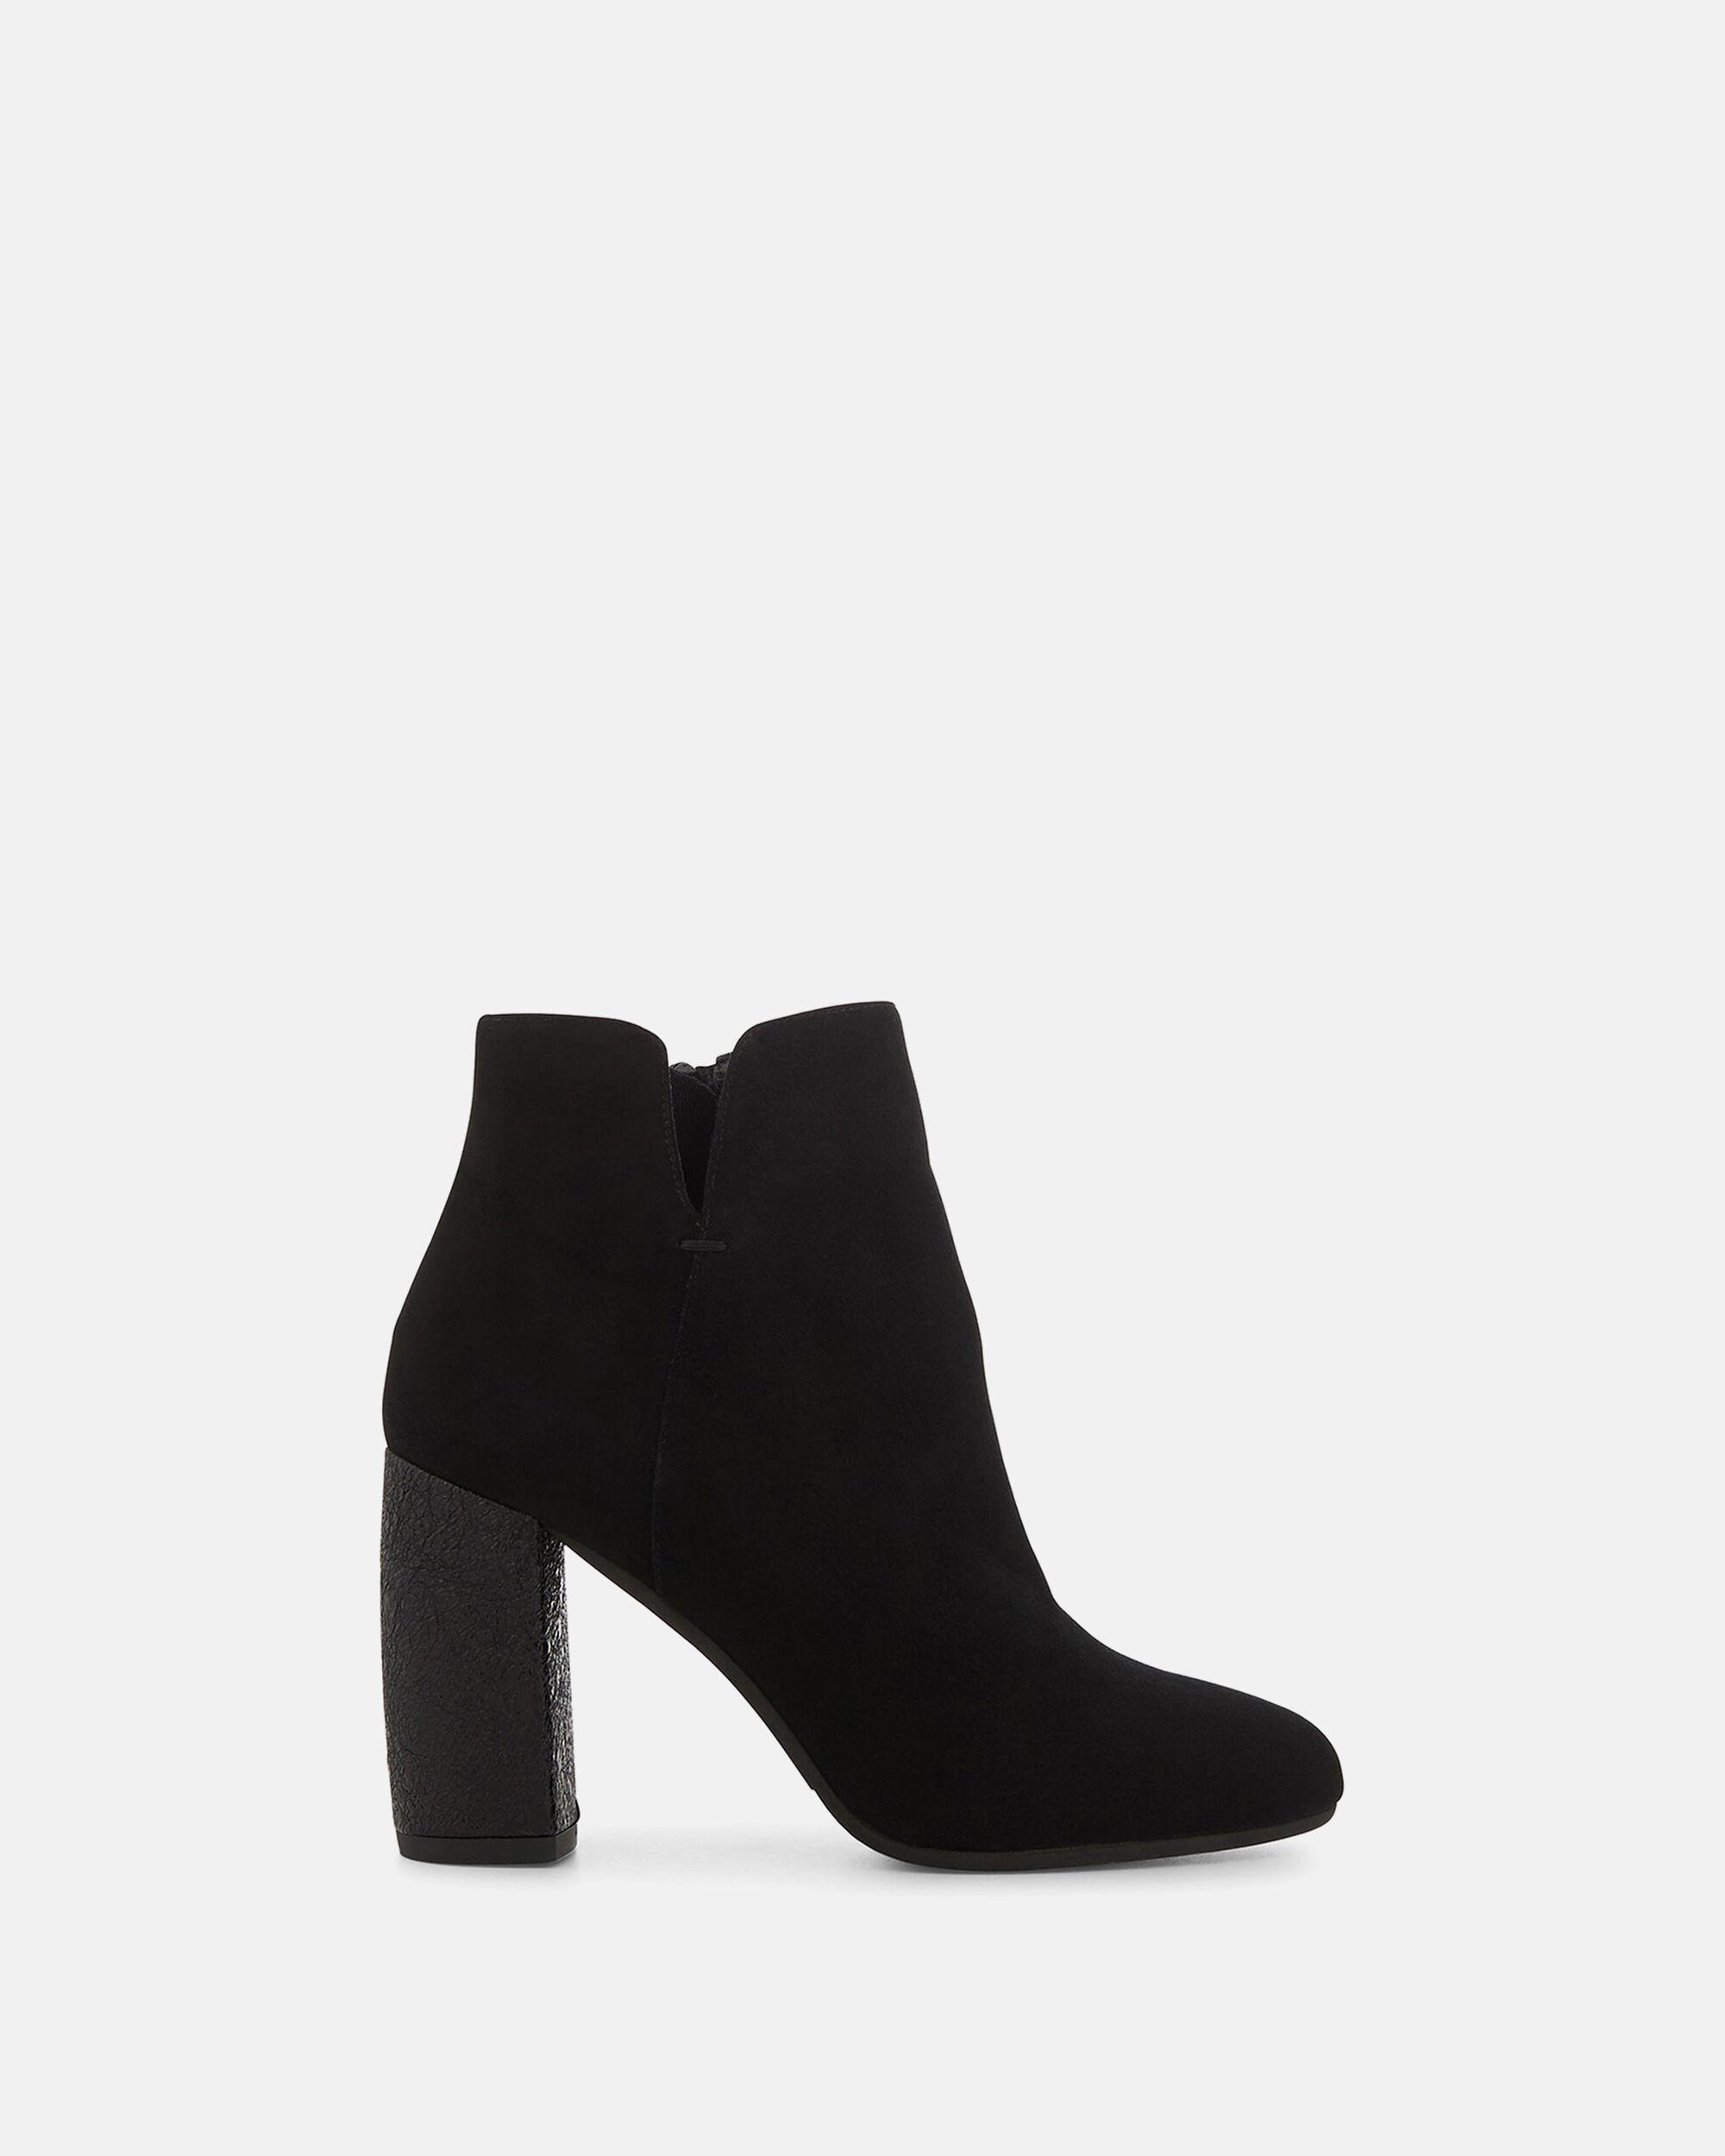 Chaussures Outlet Destockage Femme Zwephchq Pour Minelli 4wqf6t E29DHIW